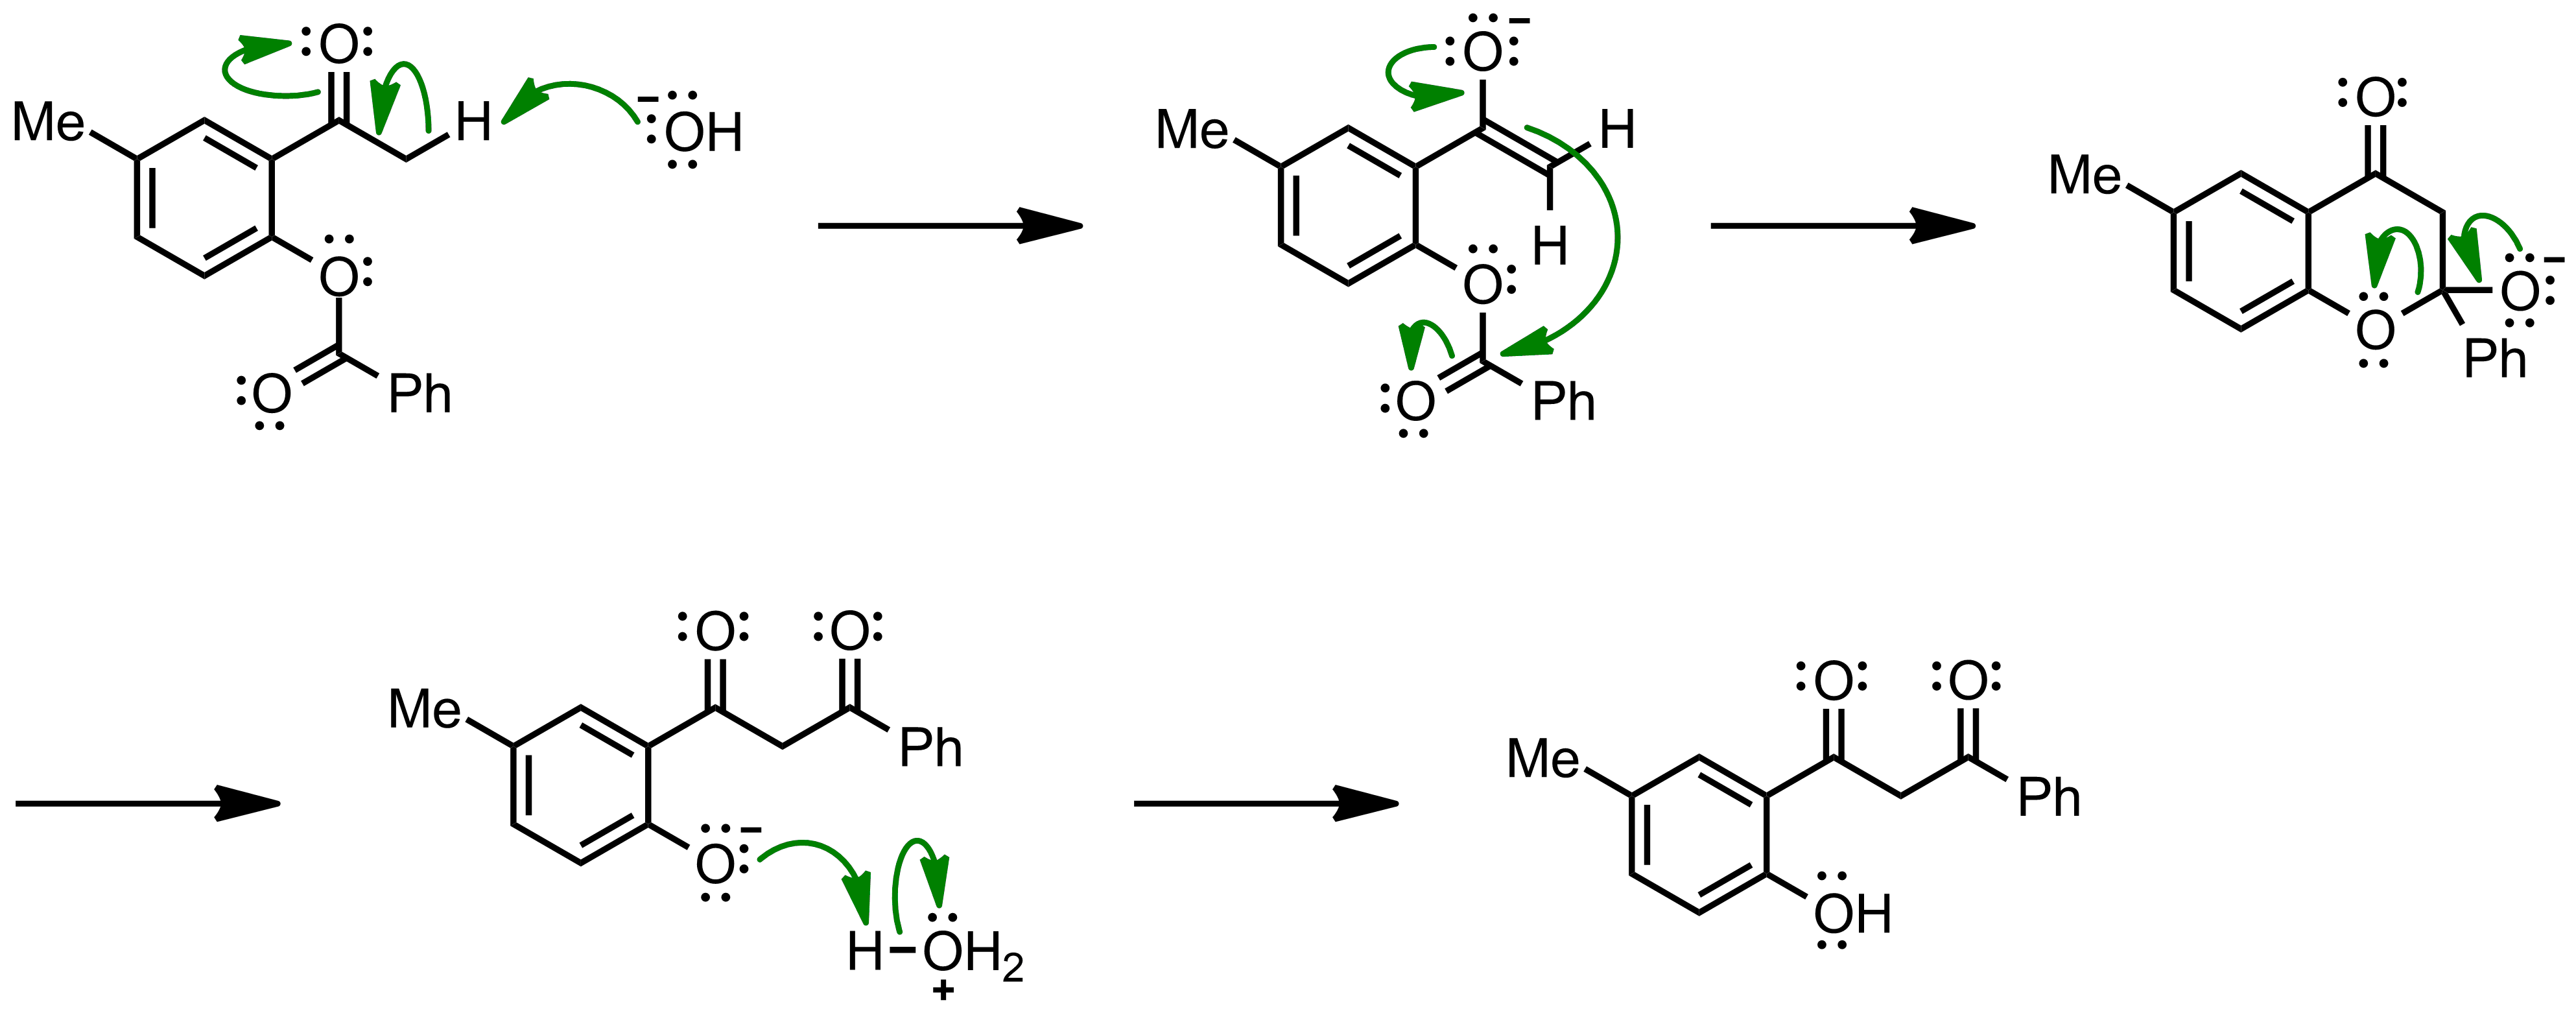 Mechanism of the Baker-Venkataraman Rearrangement